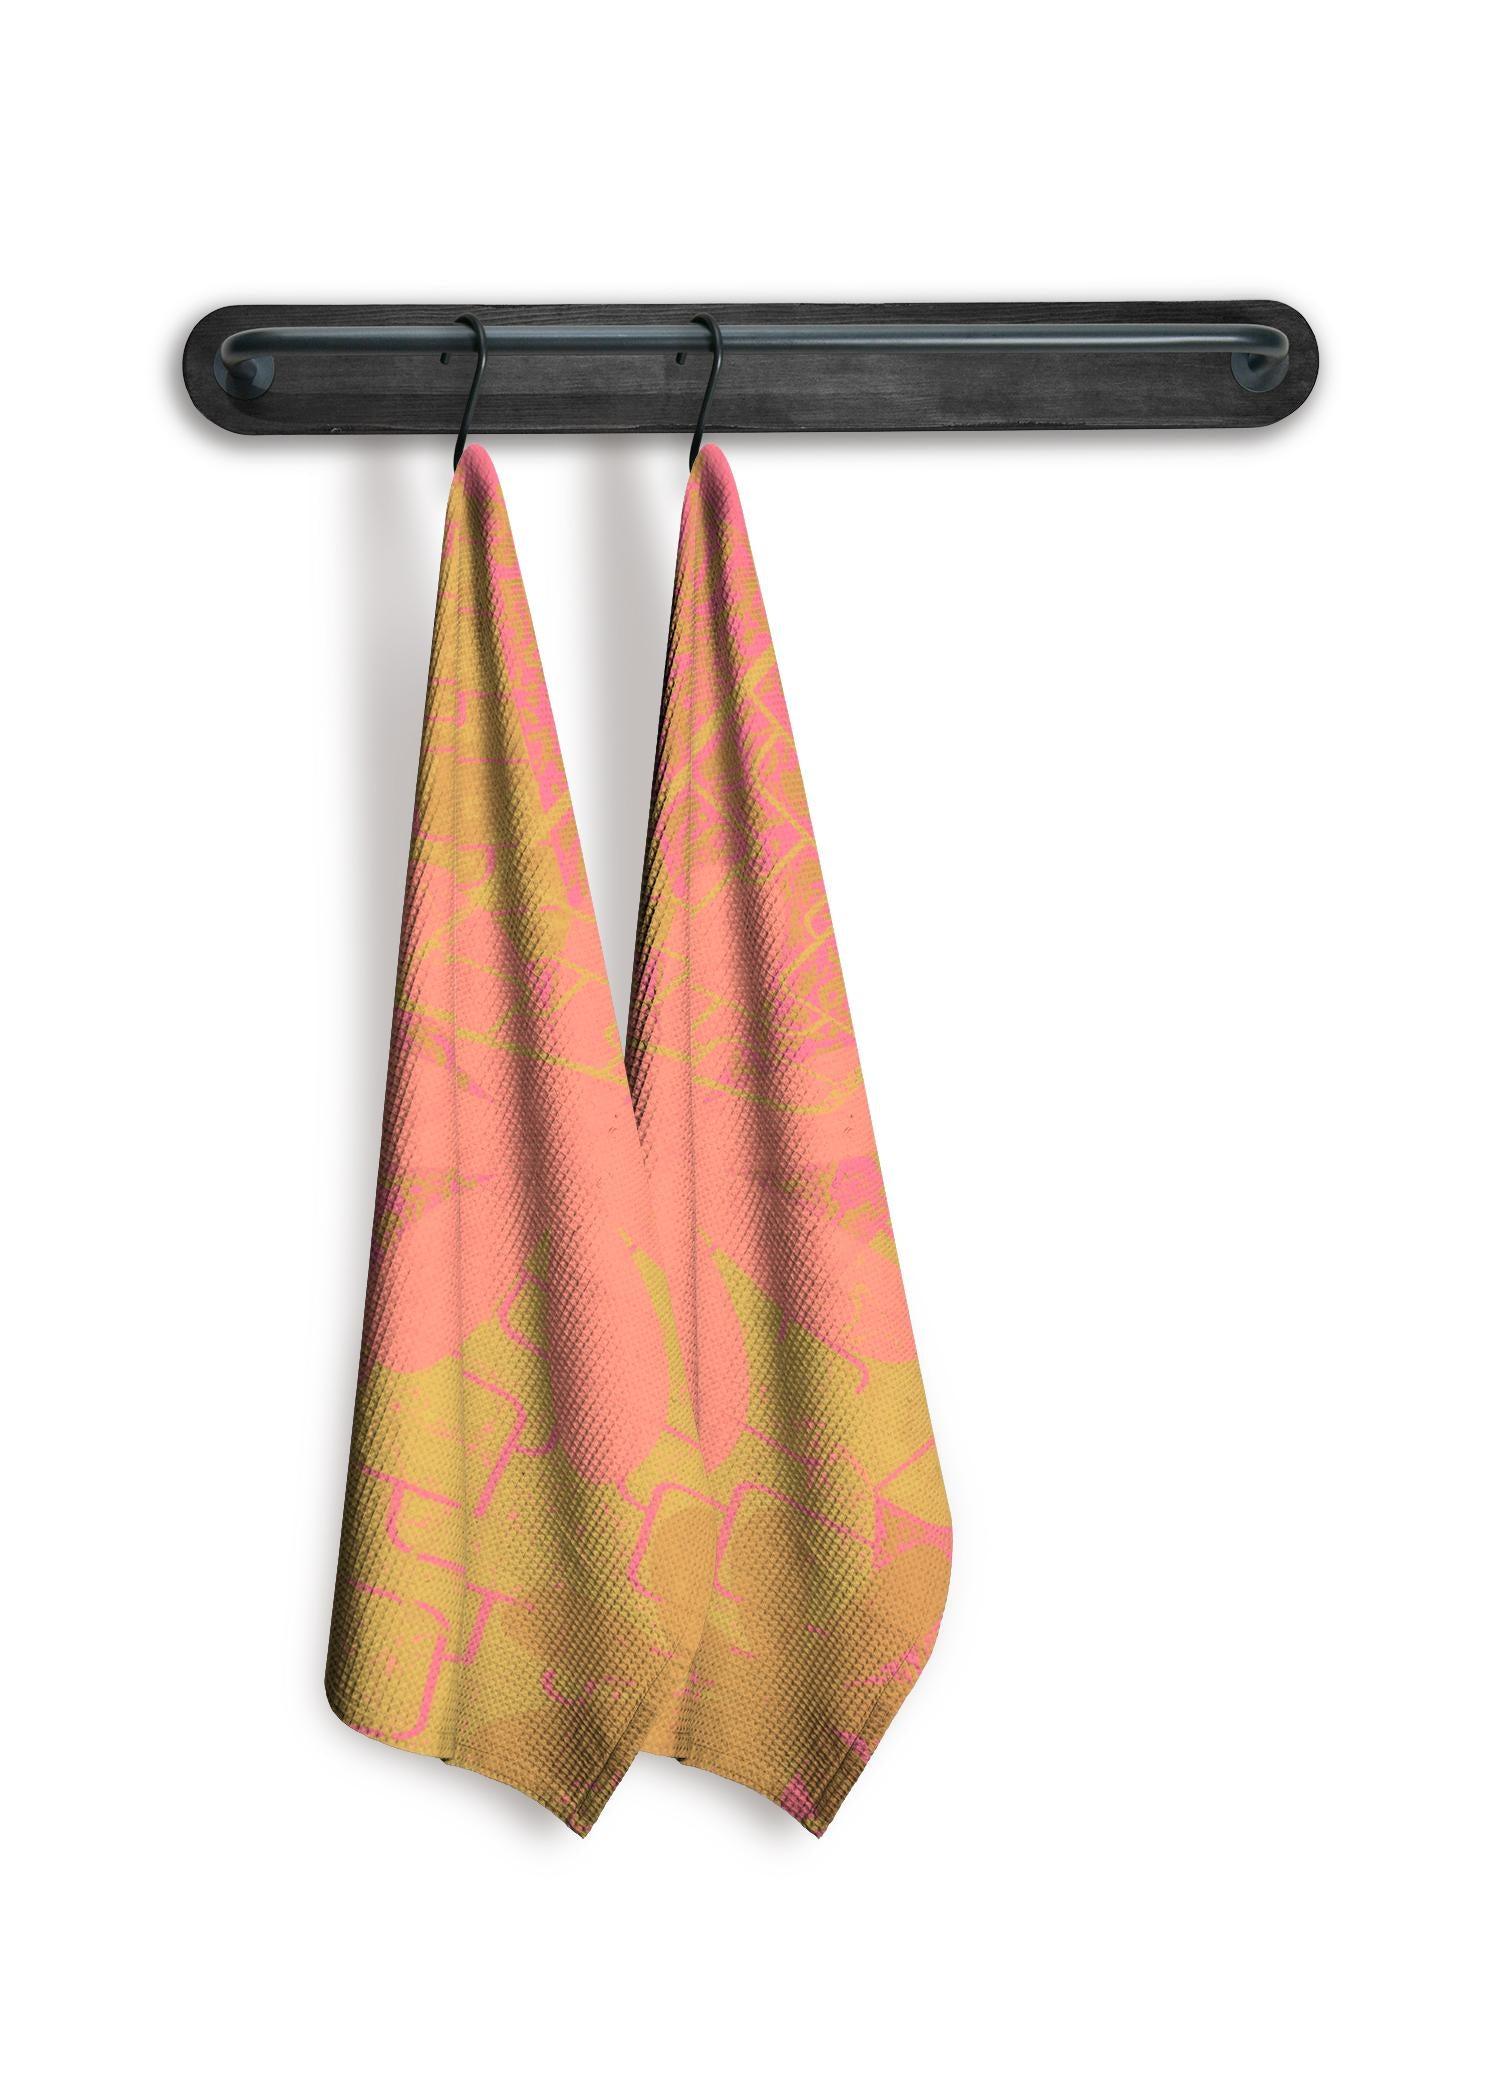 VIDA Tea Towel Set of 2 - Garden Trellis; Rose Gold by VIDA Original Artist  - Size: Mixed set